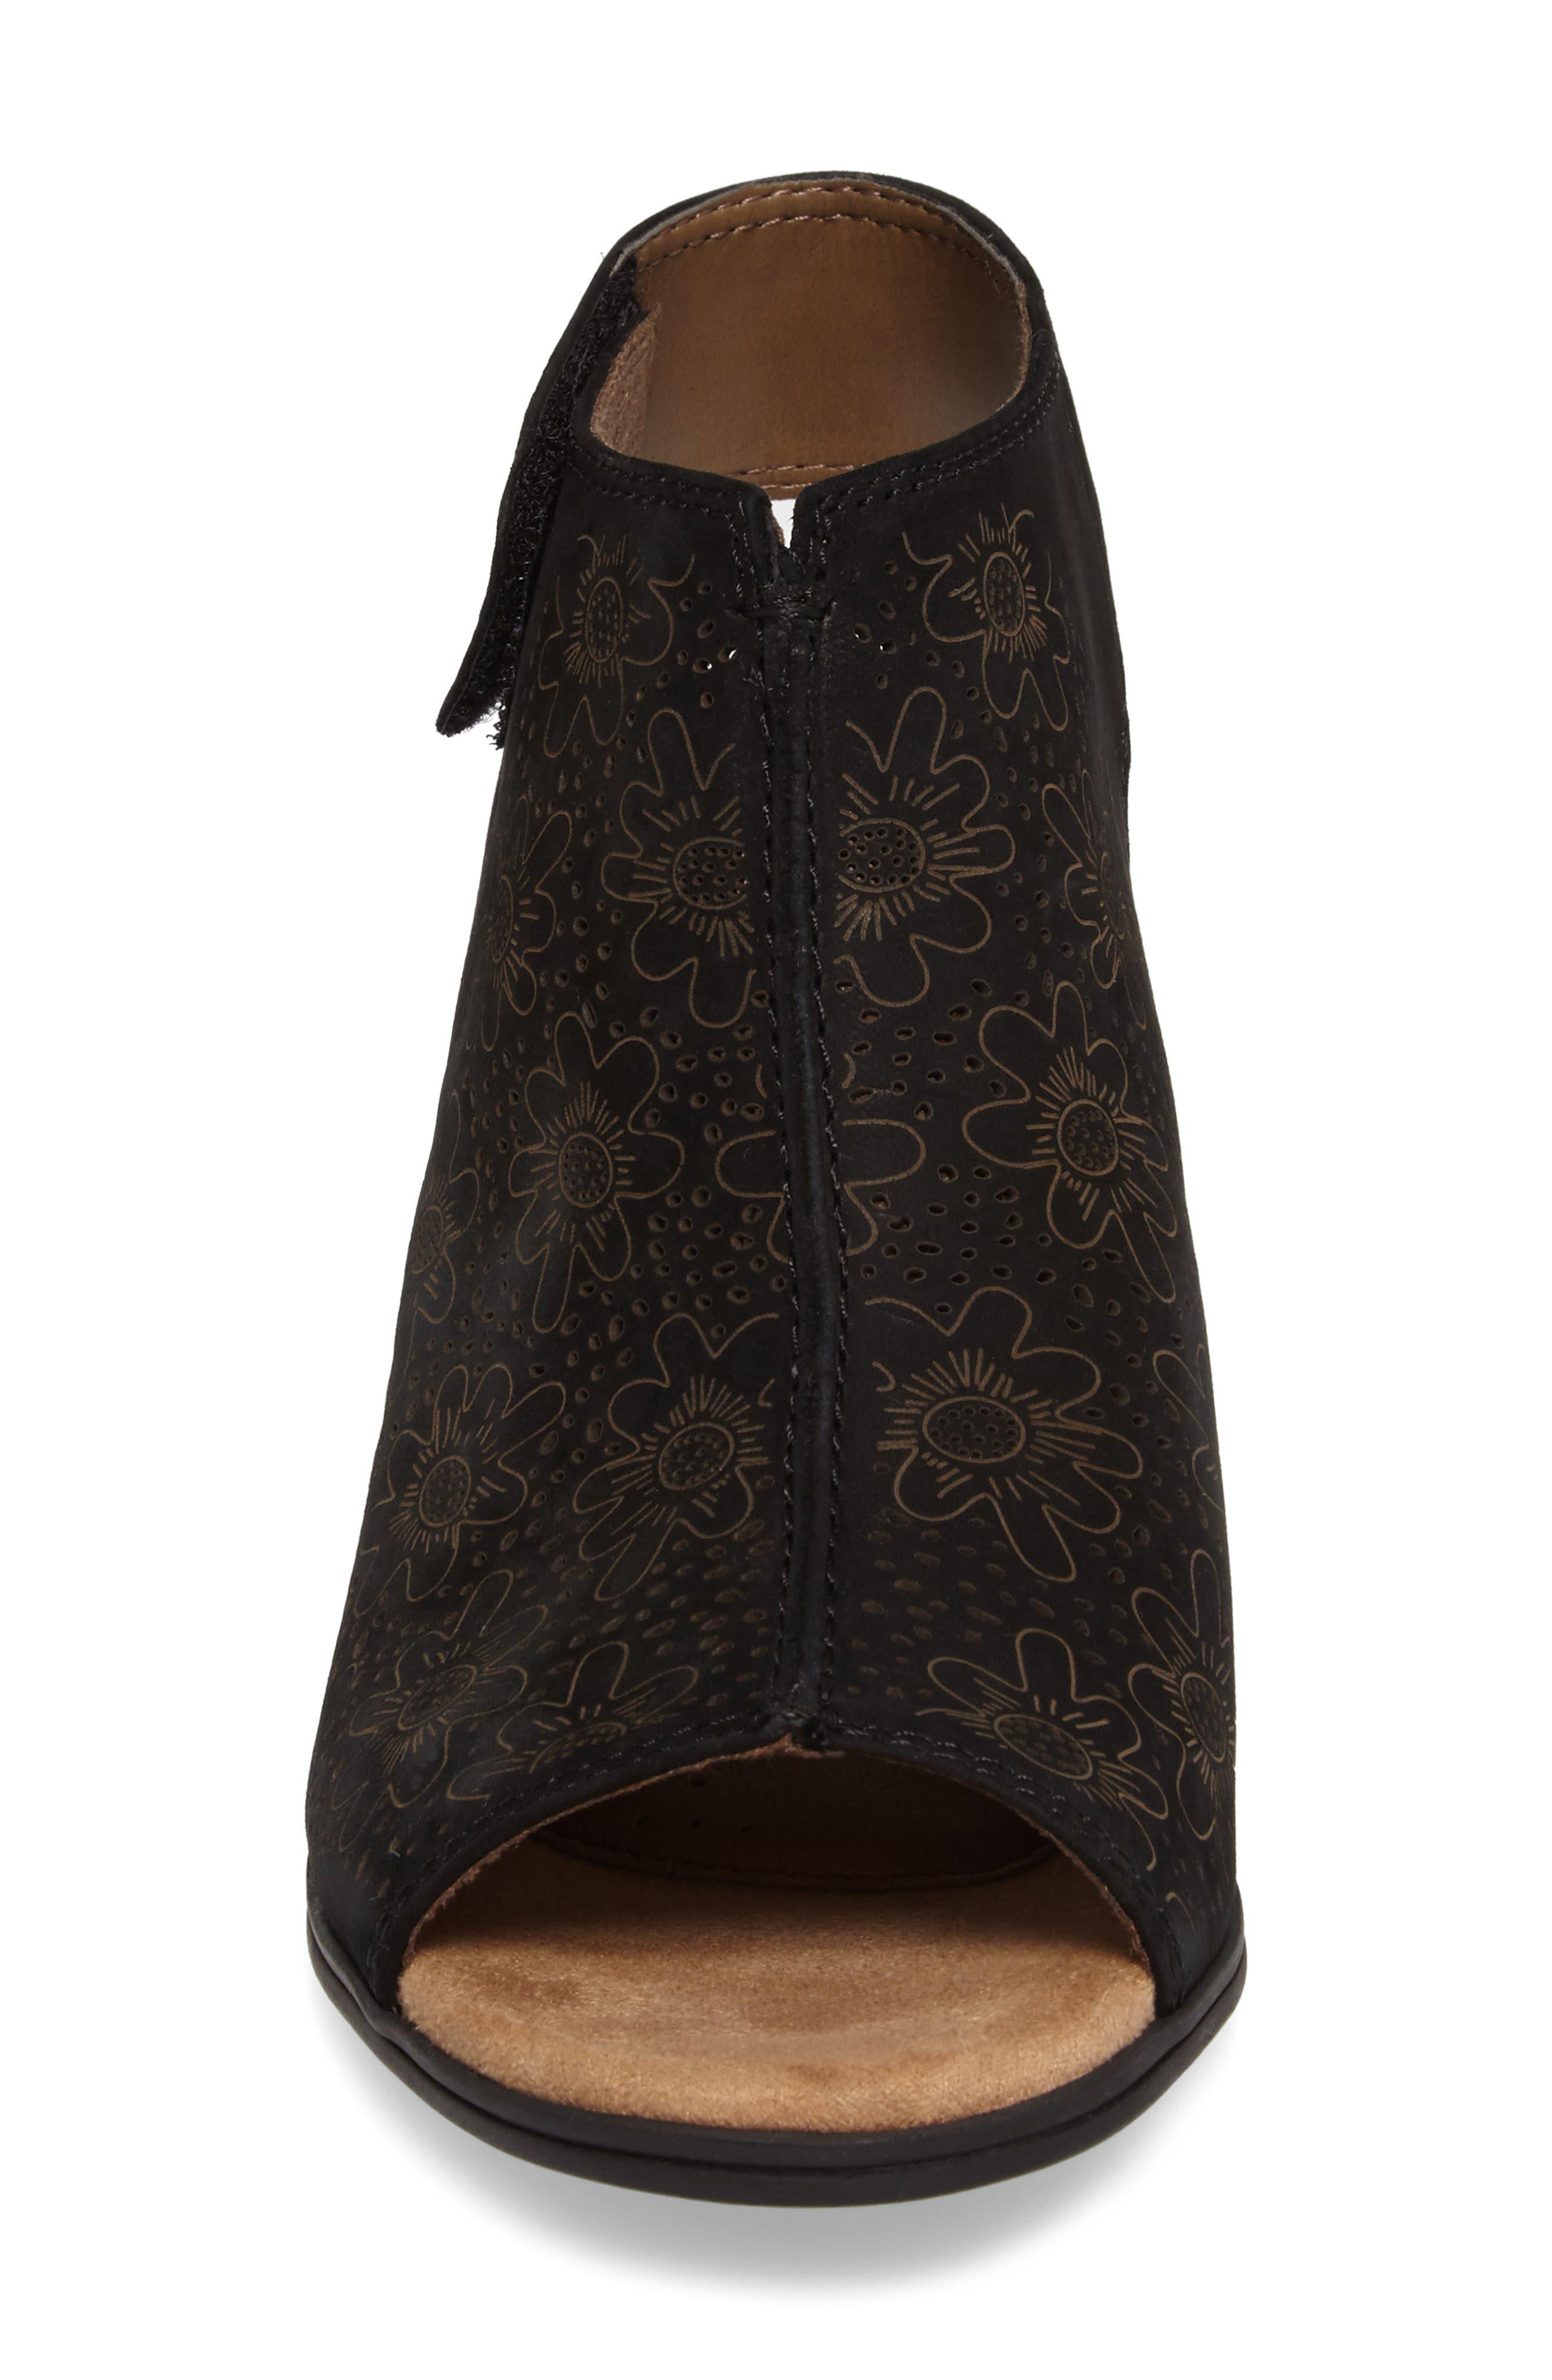 ROCKPORT COBB HILL,                             Hattie Perforated Slingback Sandal,                             Alternate thumbnail 4, color,                             BLACK NUBUCK